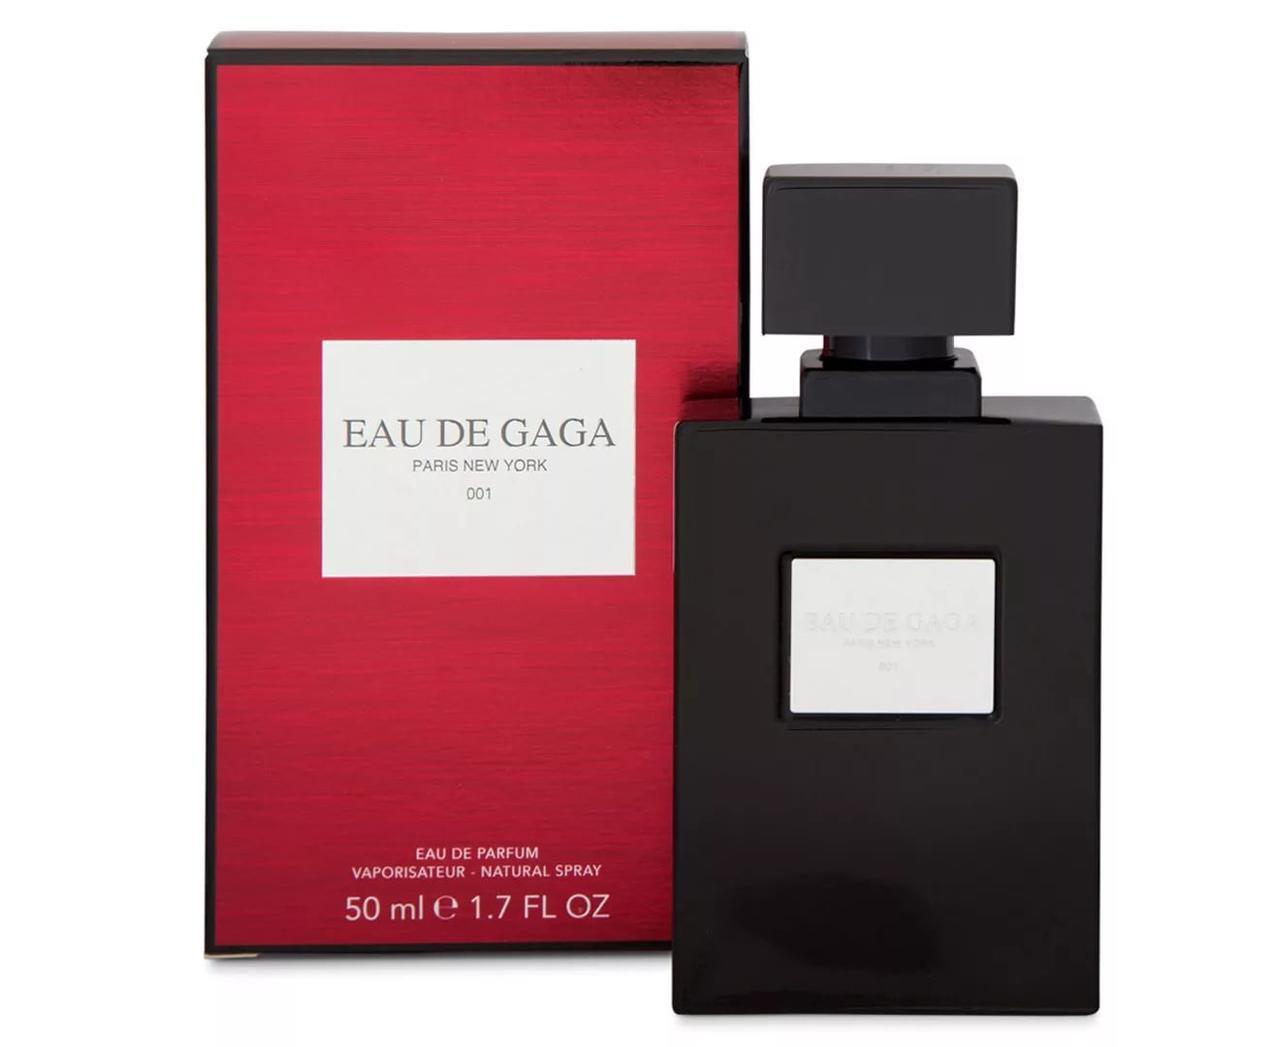 Lady Gaga Eau De Gaga001 75ml edp